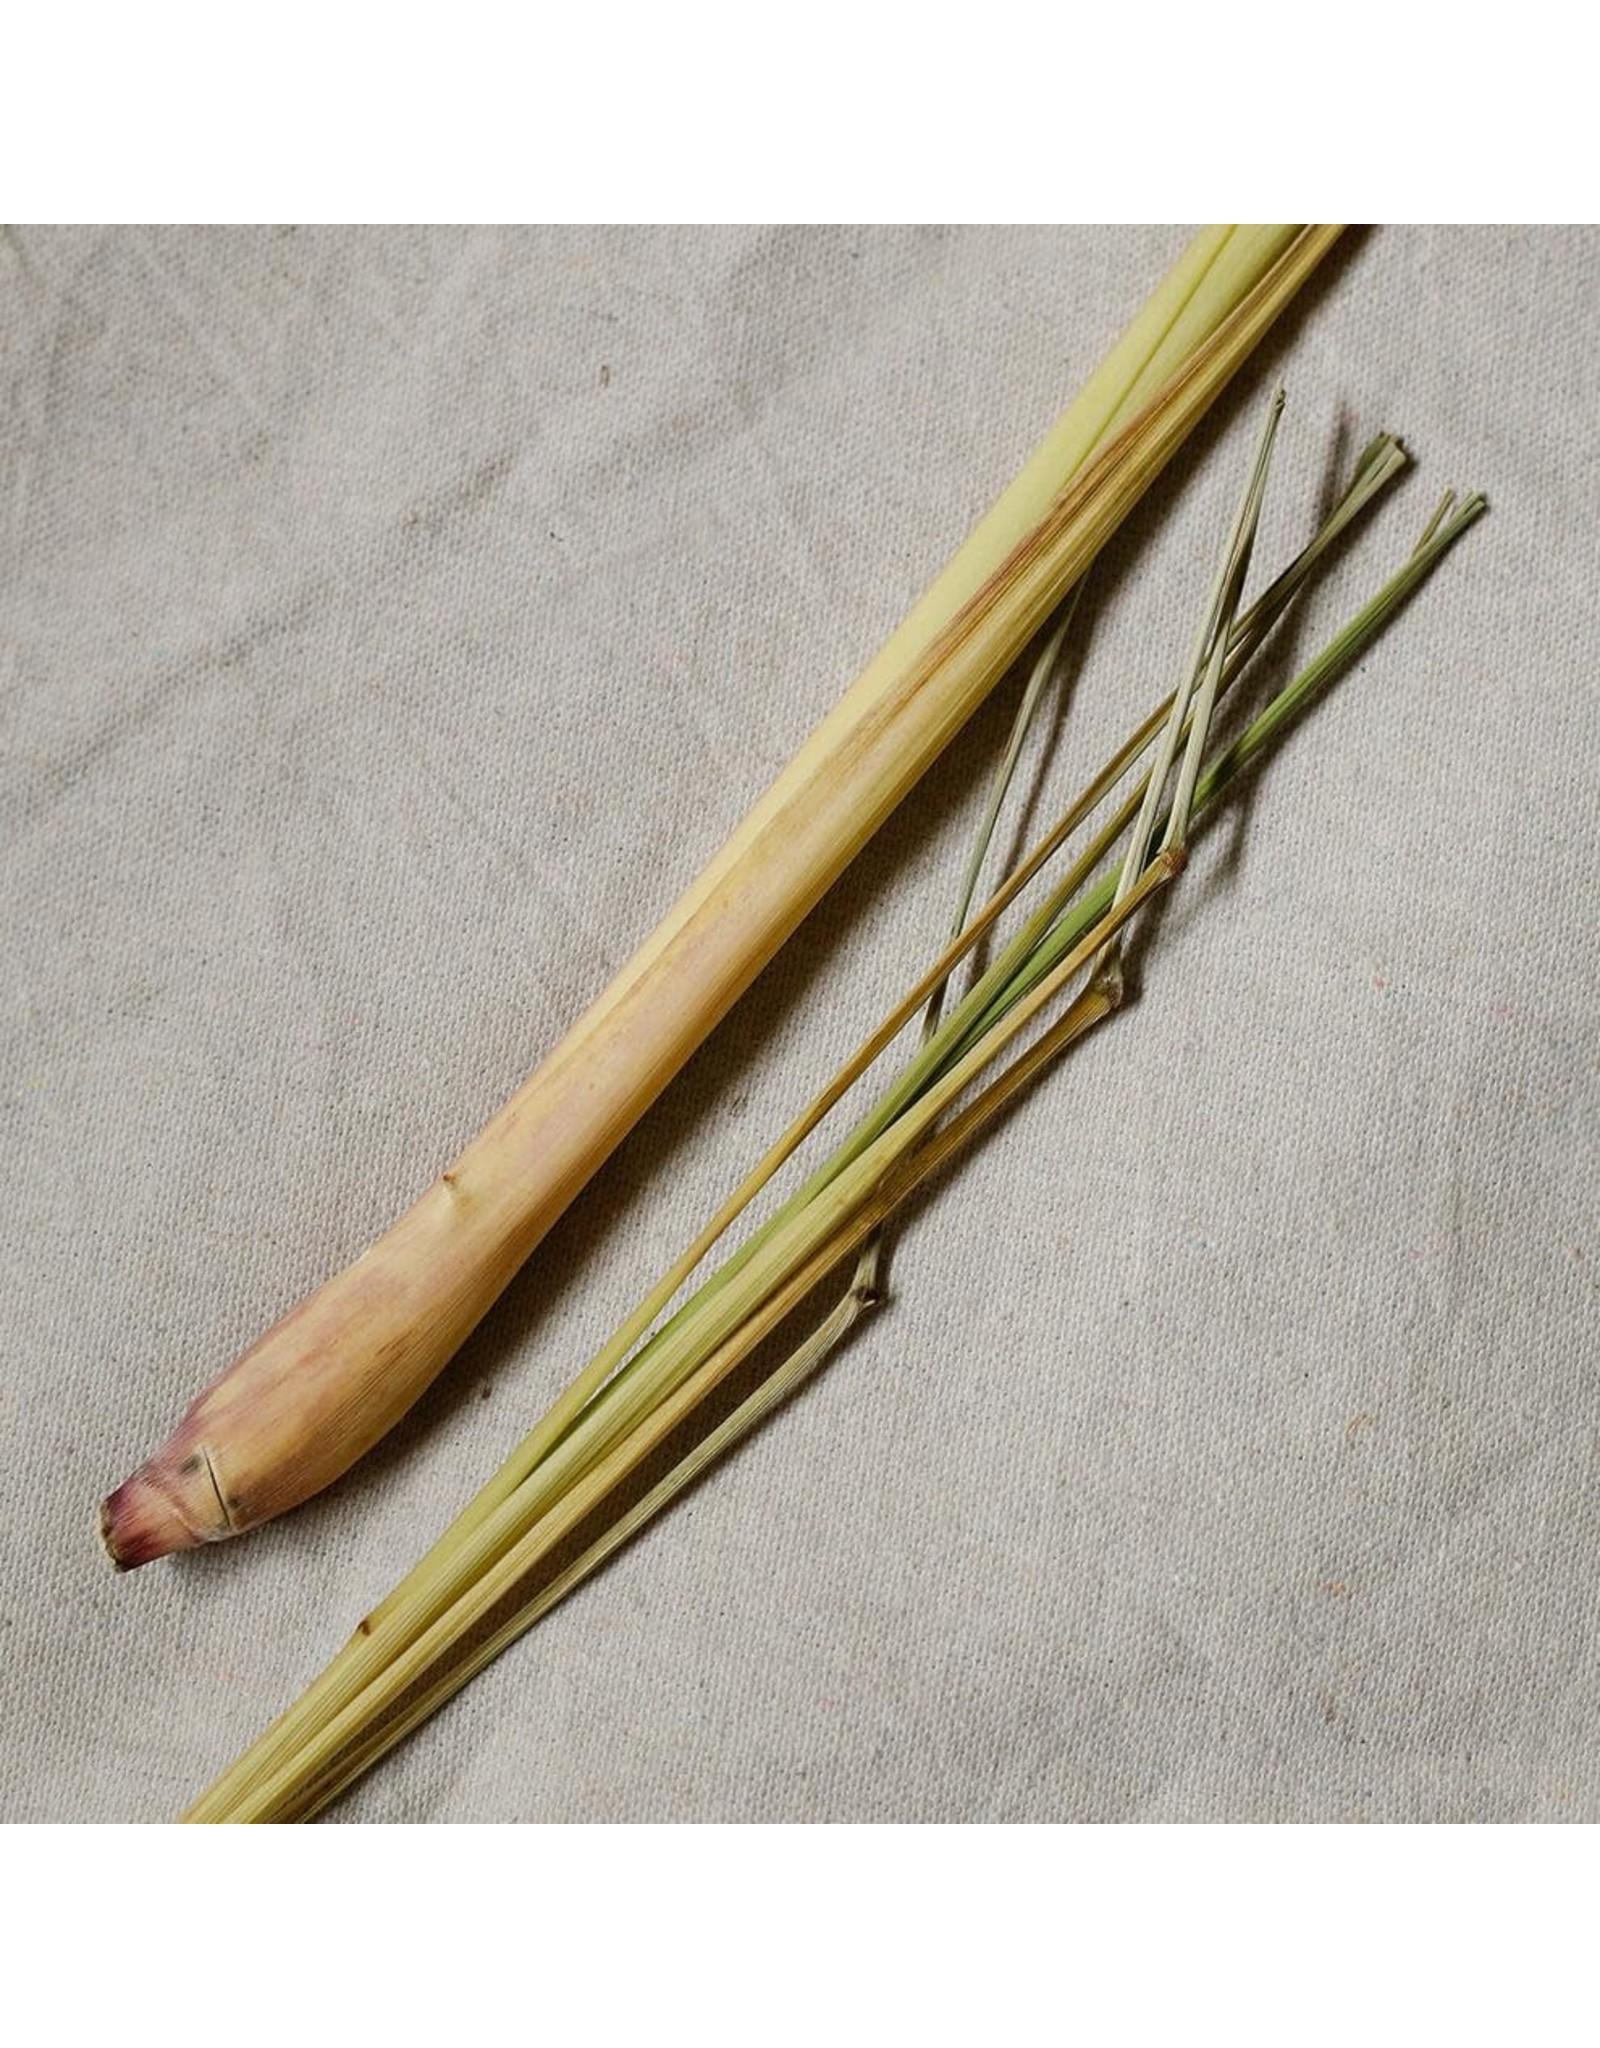 Vitruvi Vitruvi Lemongrass Essential Oil